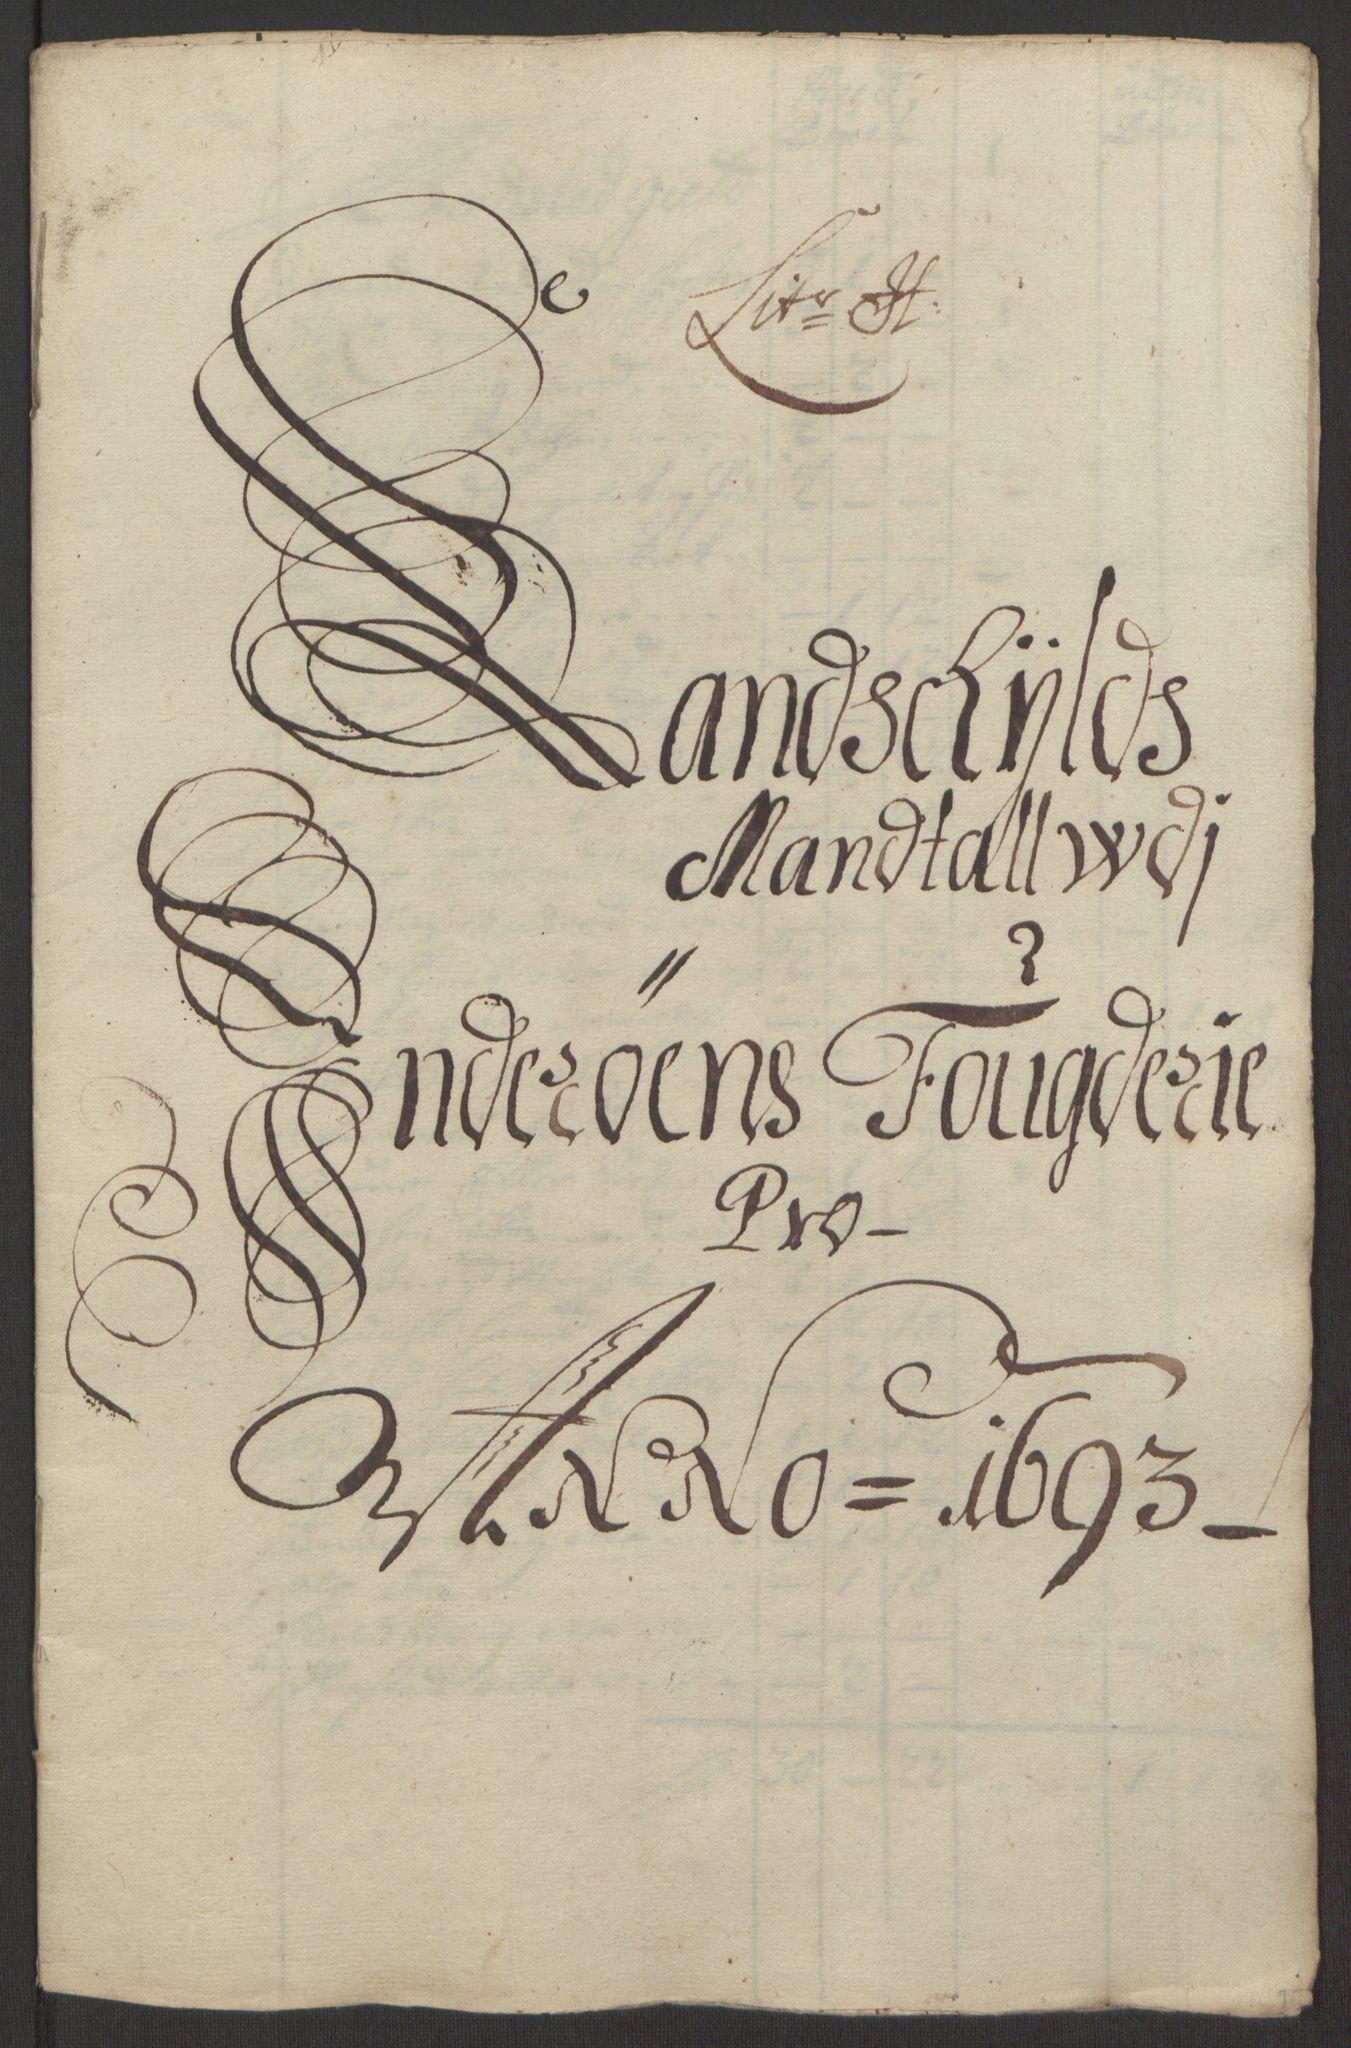 RA, Rentekammeret inntil 1814, Reviderte regnskaper, Fogderegnskap, R63/L4308: Fogderegnskap Inderøy, 1692-1694, s. 469